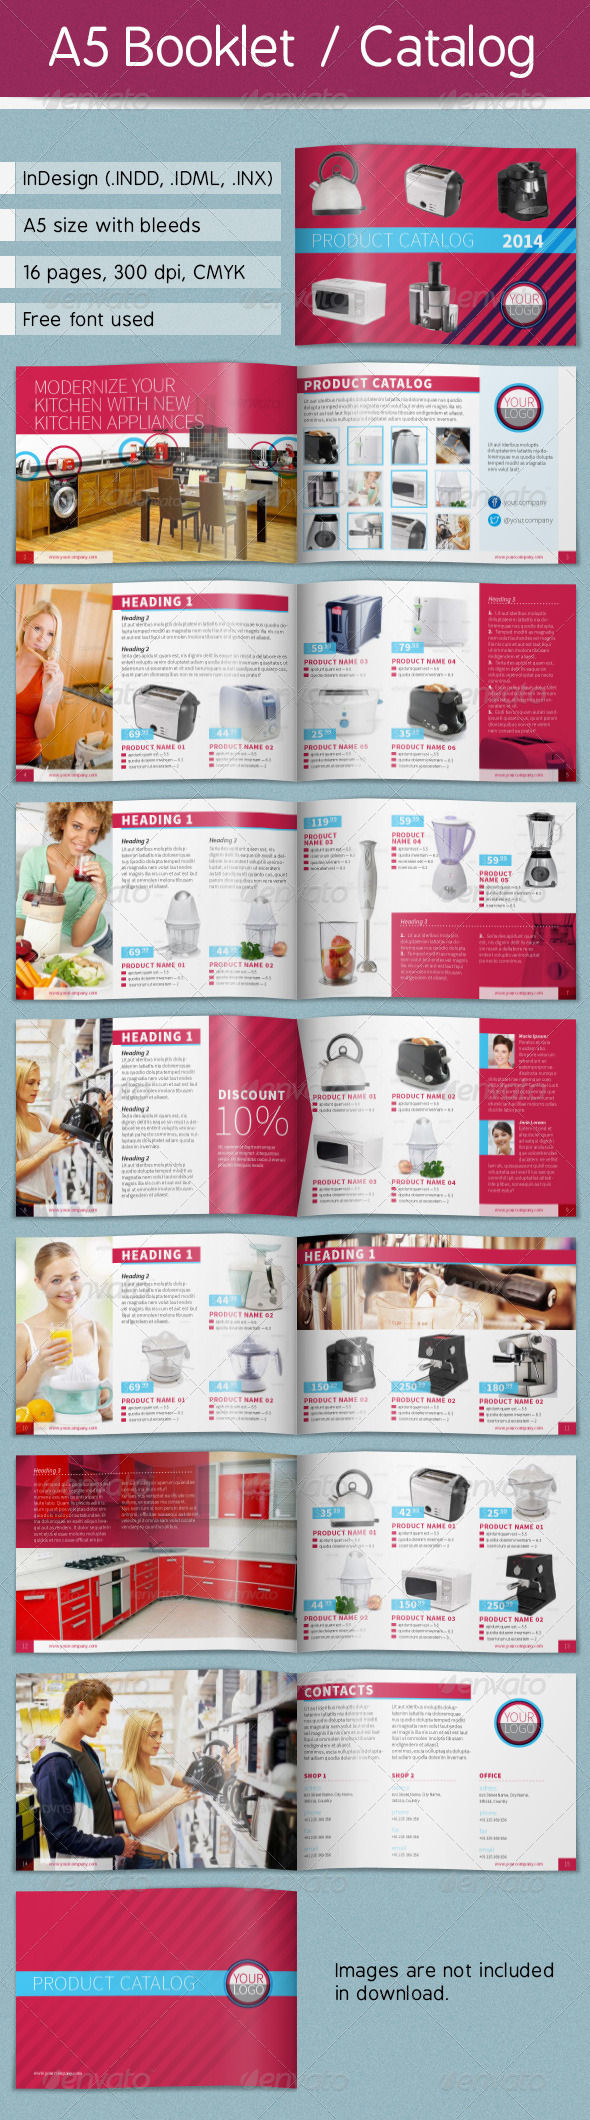 GraphicRiver A5 Booklet Catalog 4823612